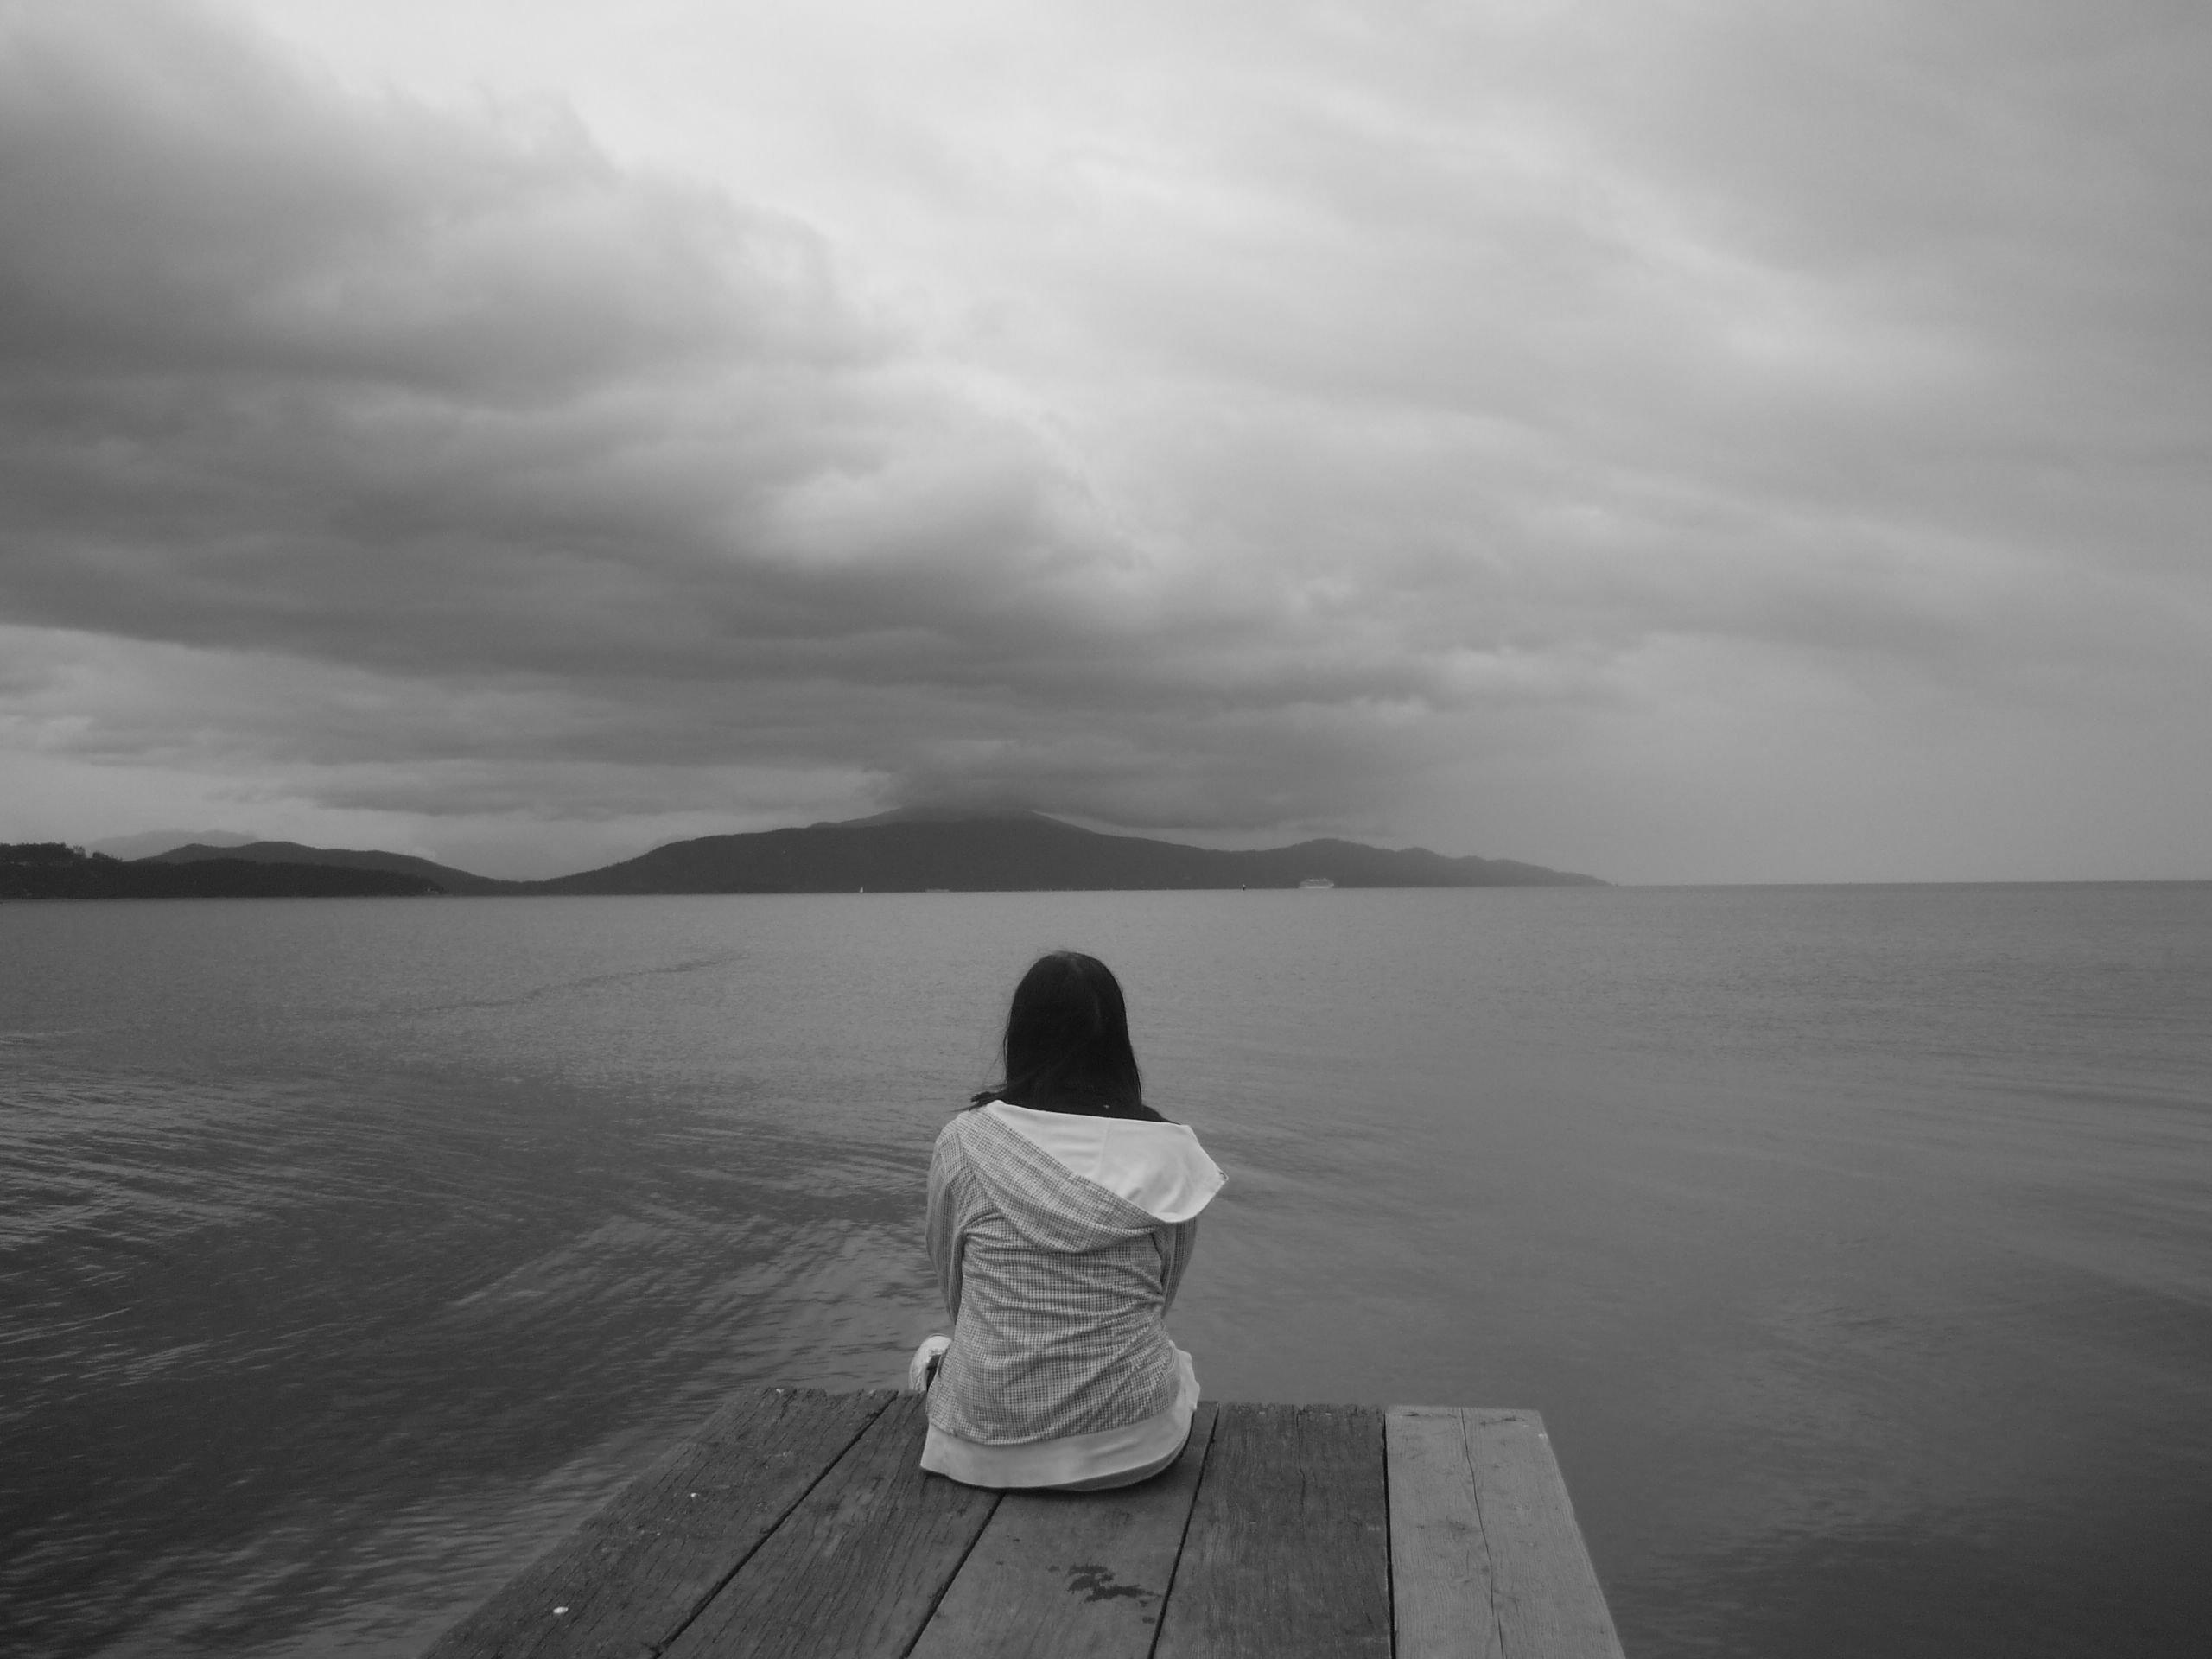 depression Sad Mood Sorrow Dark People Wallpapers HD 2560x1920